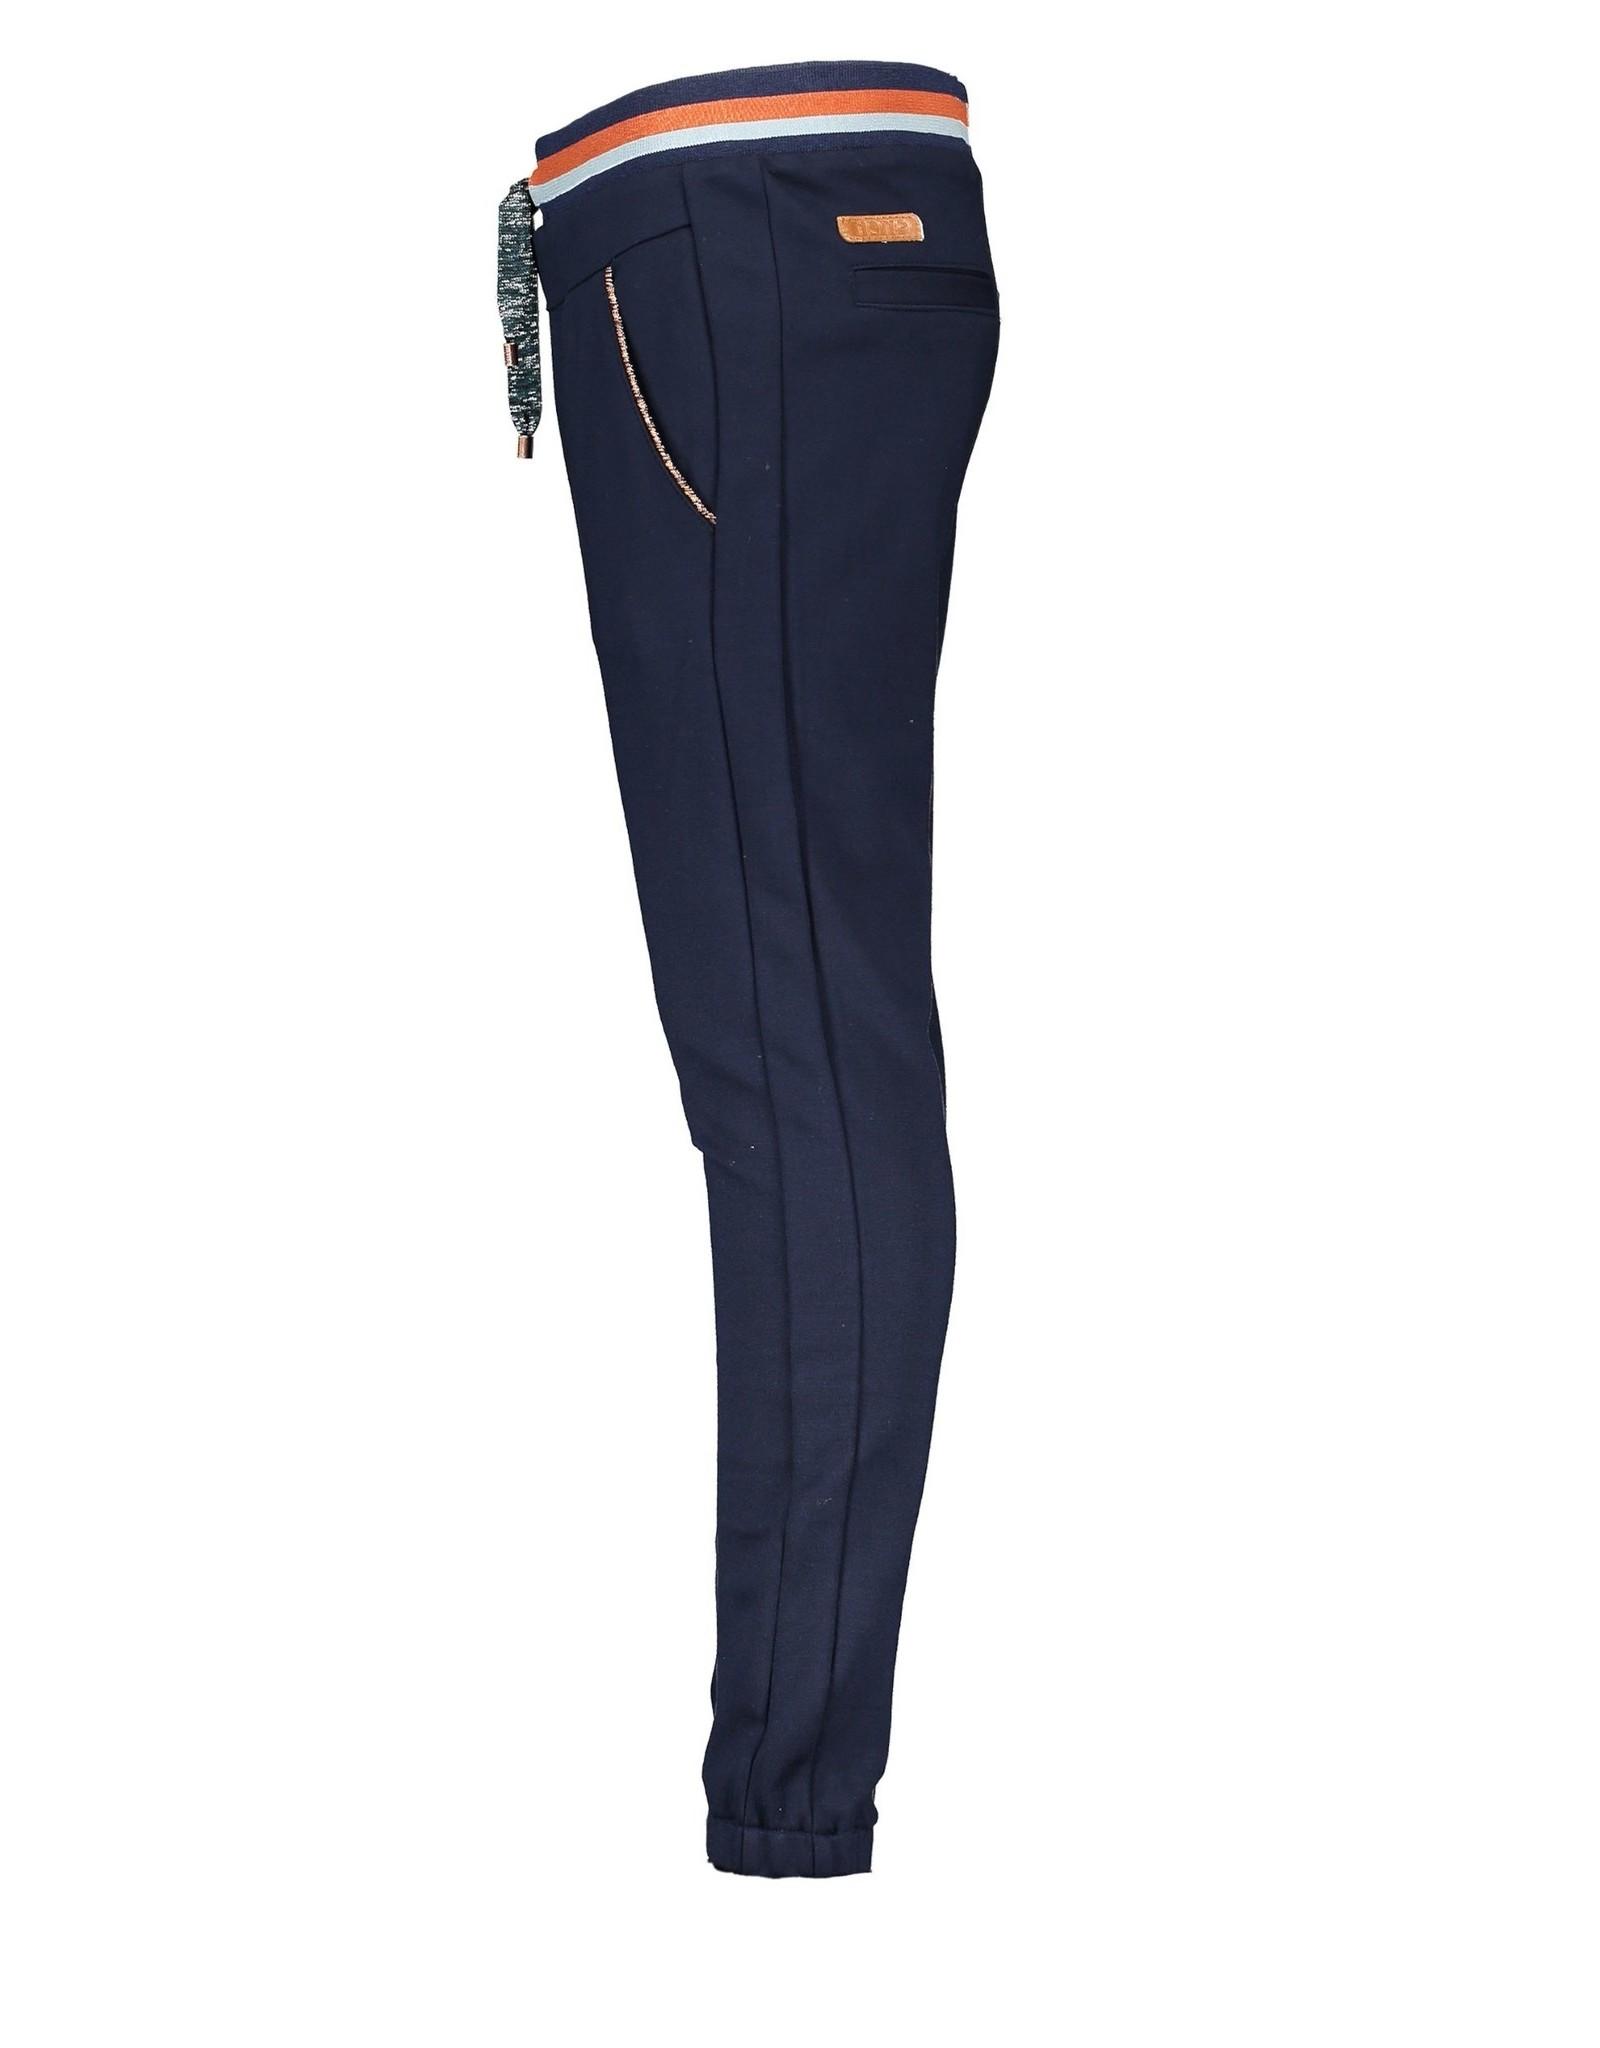 Nono NONO pants 5602 navy blazer